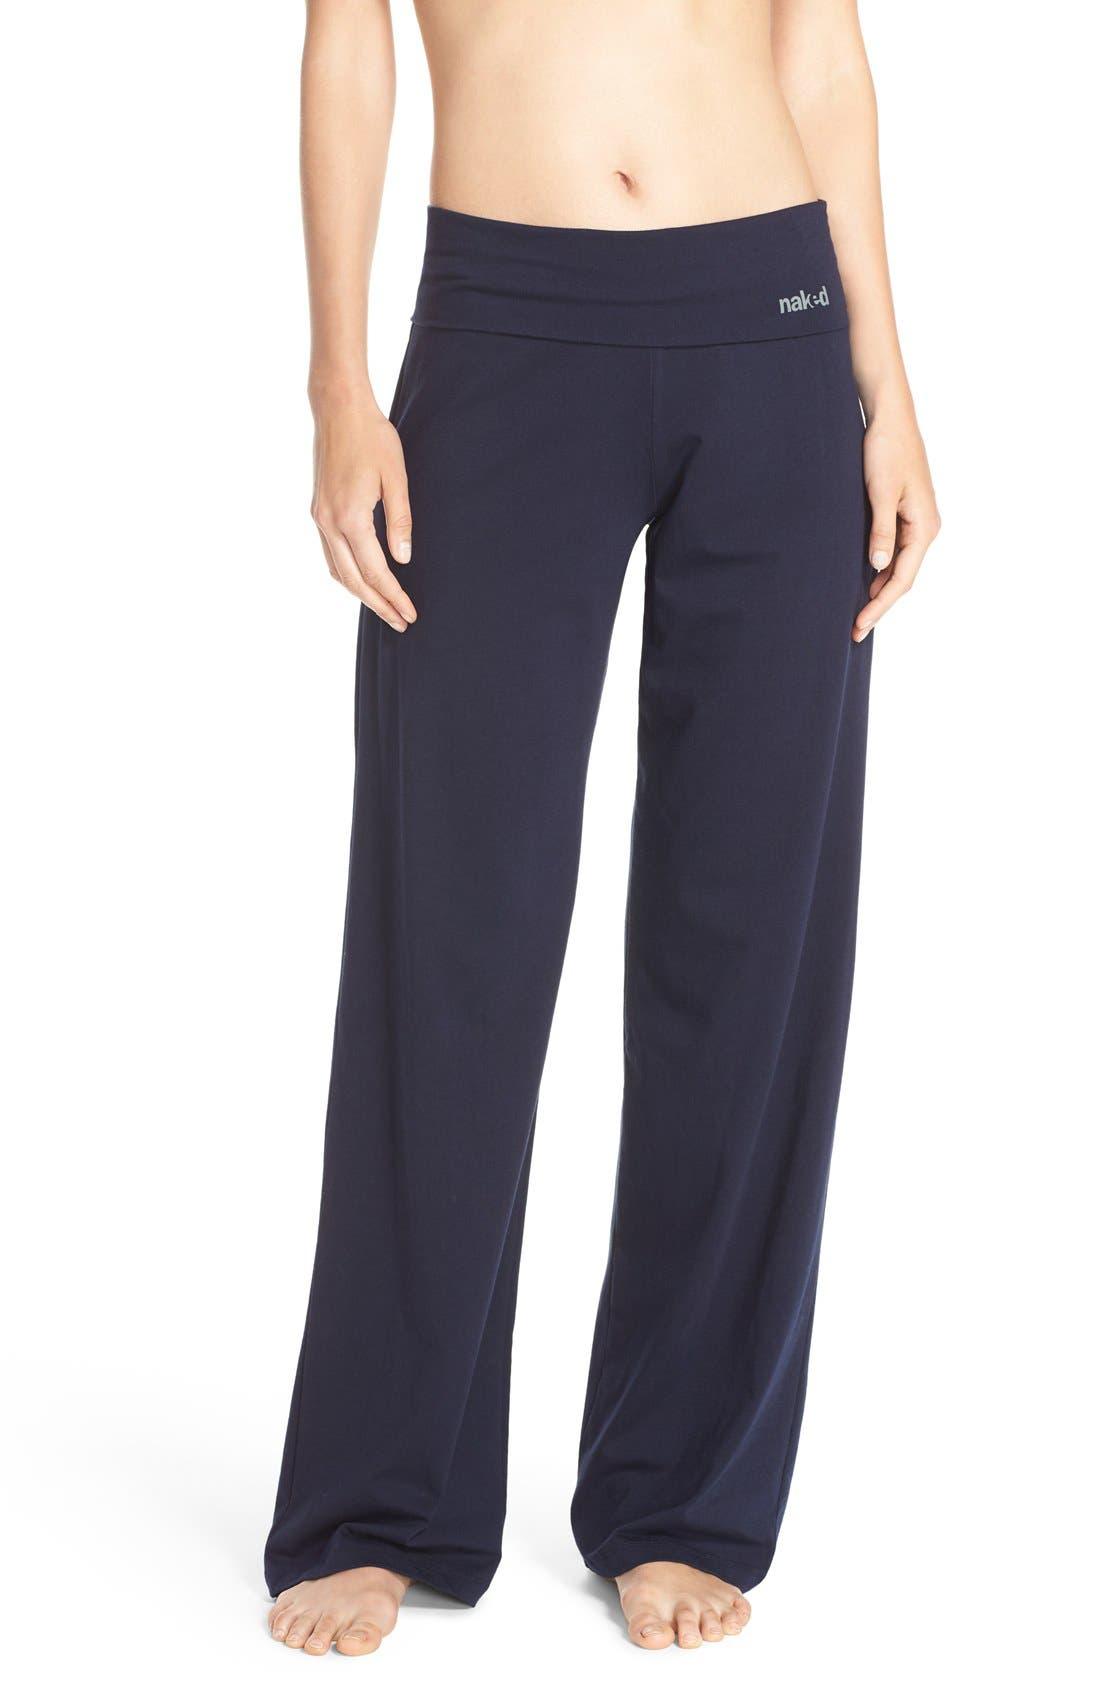 Naked Wide Leg Stretch Cotton Pajama Pants